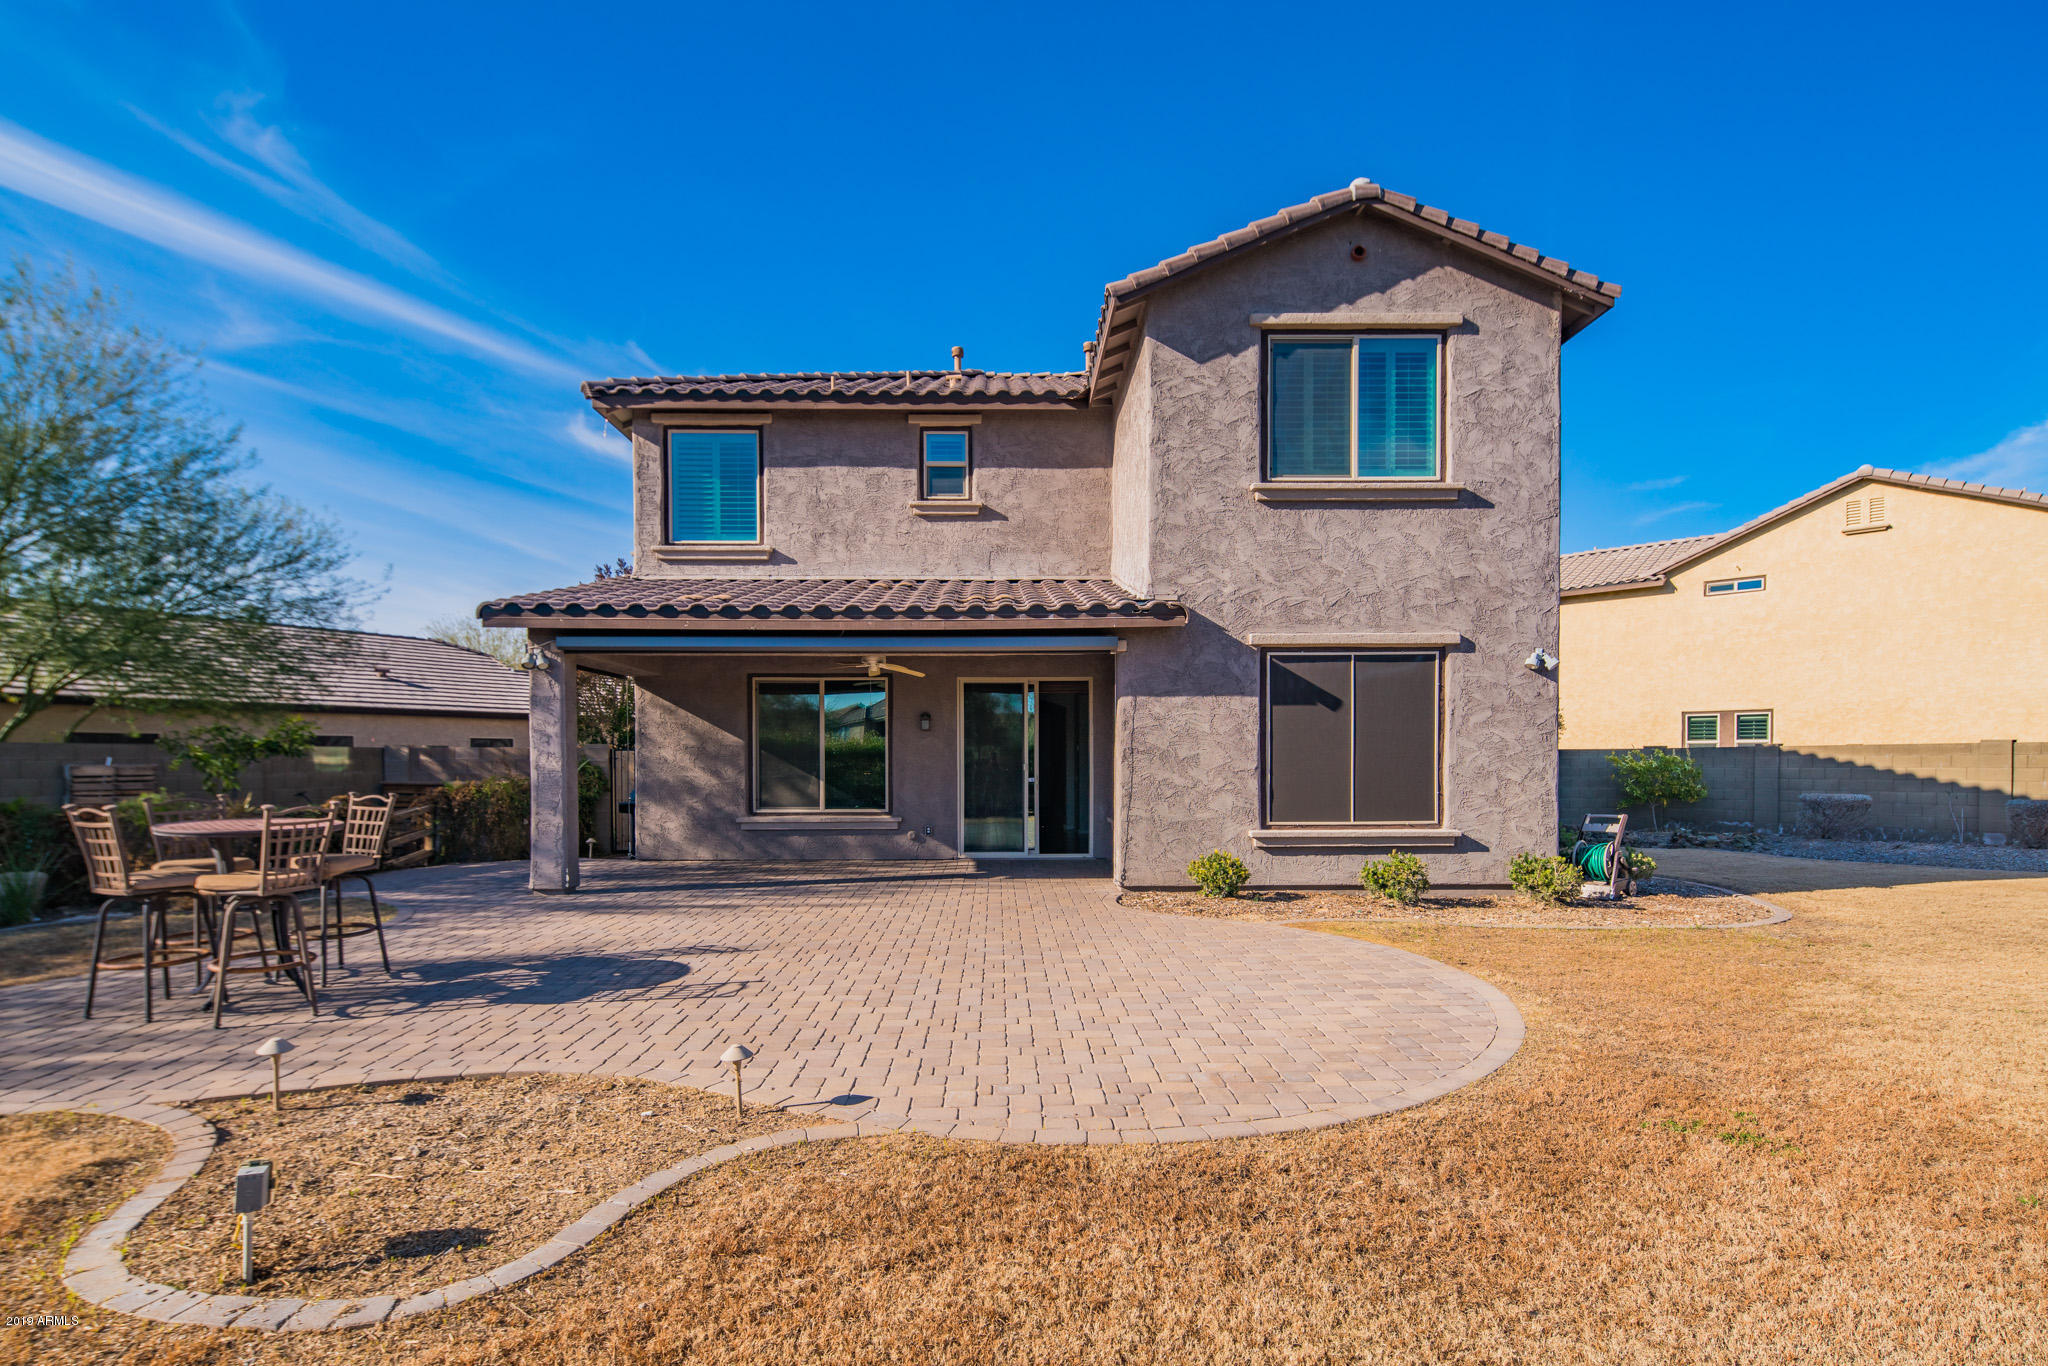 MLS 5871083 3819 E EMBER GLOW Way, Phoenix, AZ 85050 Phoenix AZ Desert Ridge